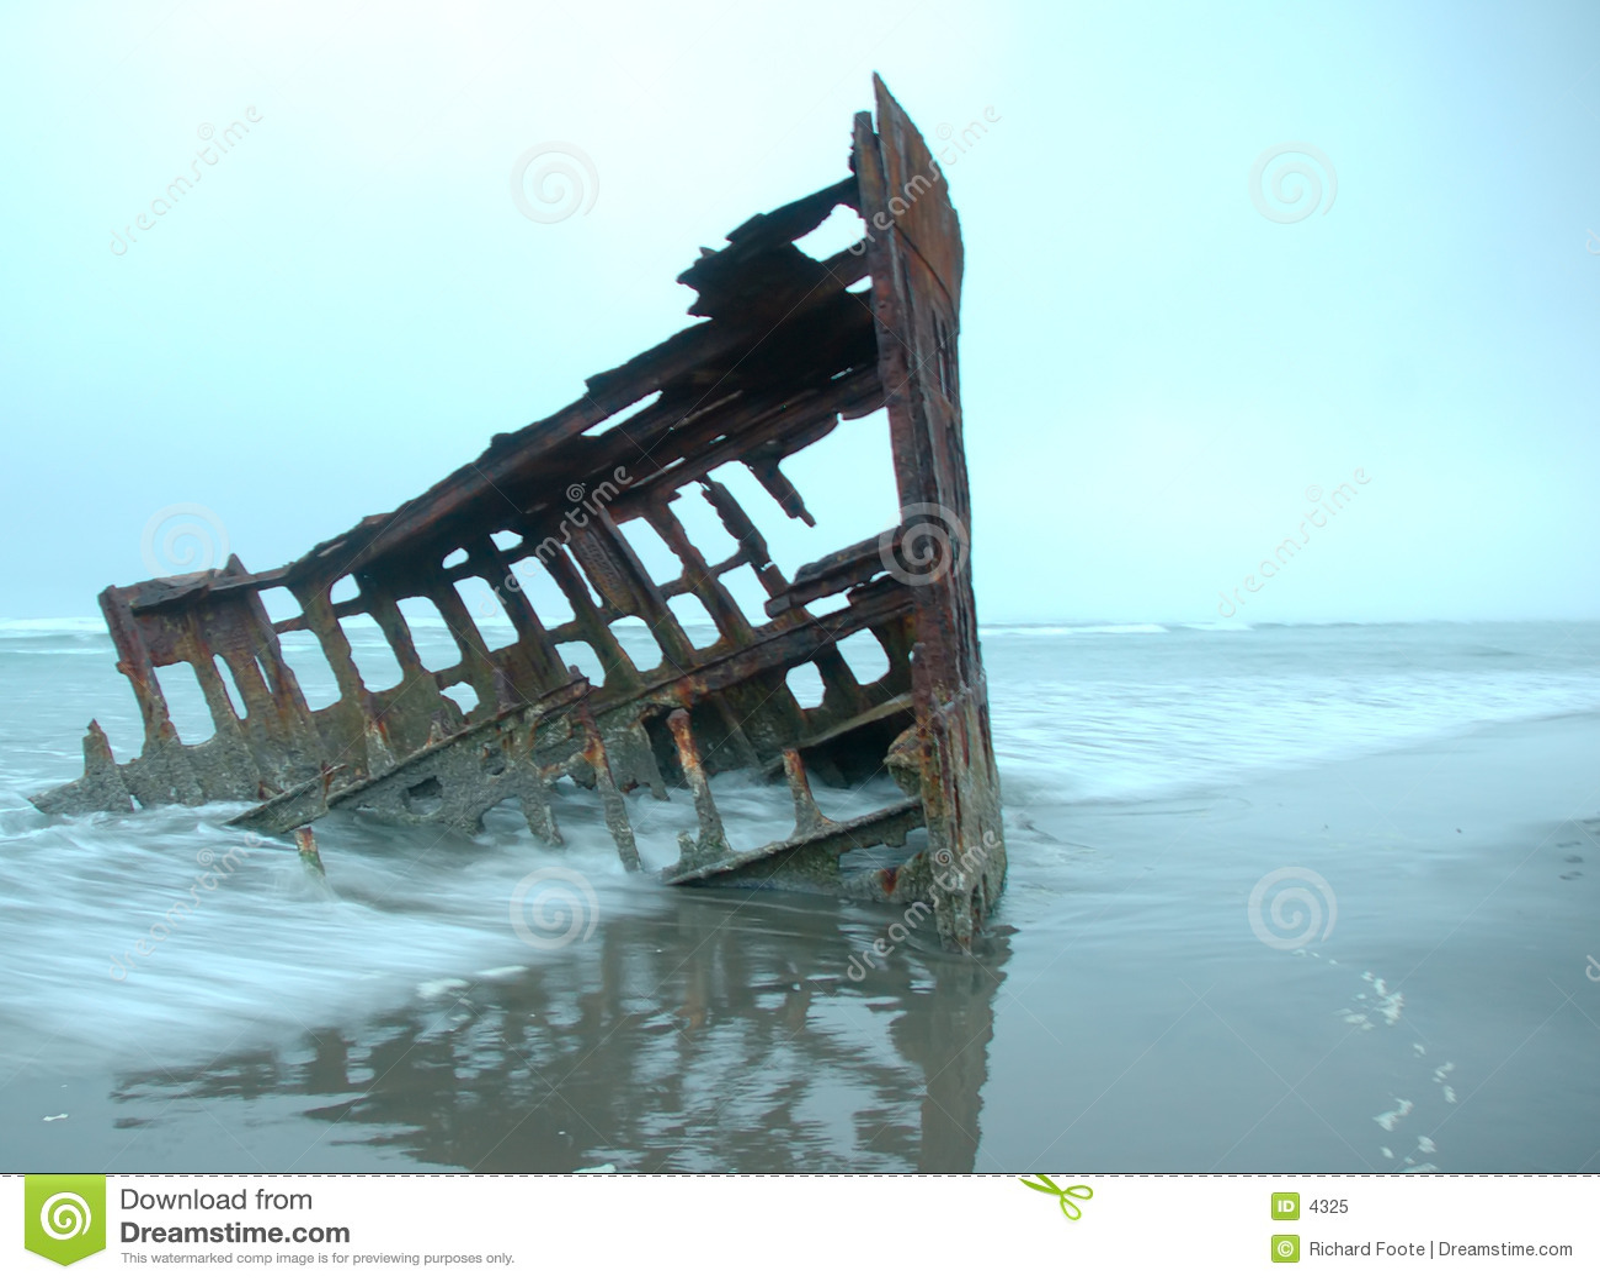 кораблекрушение peter iredale